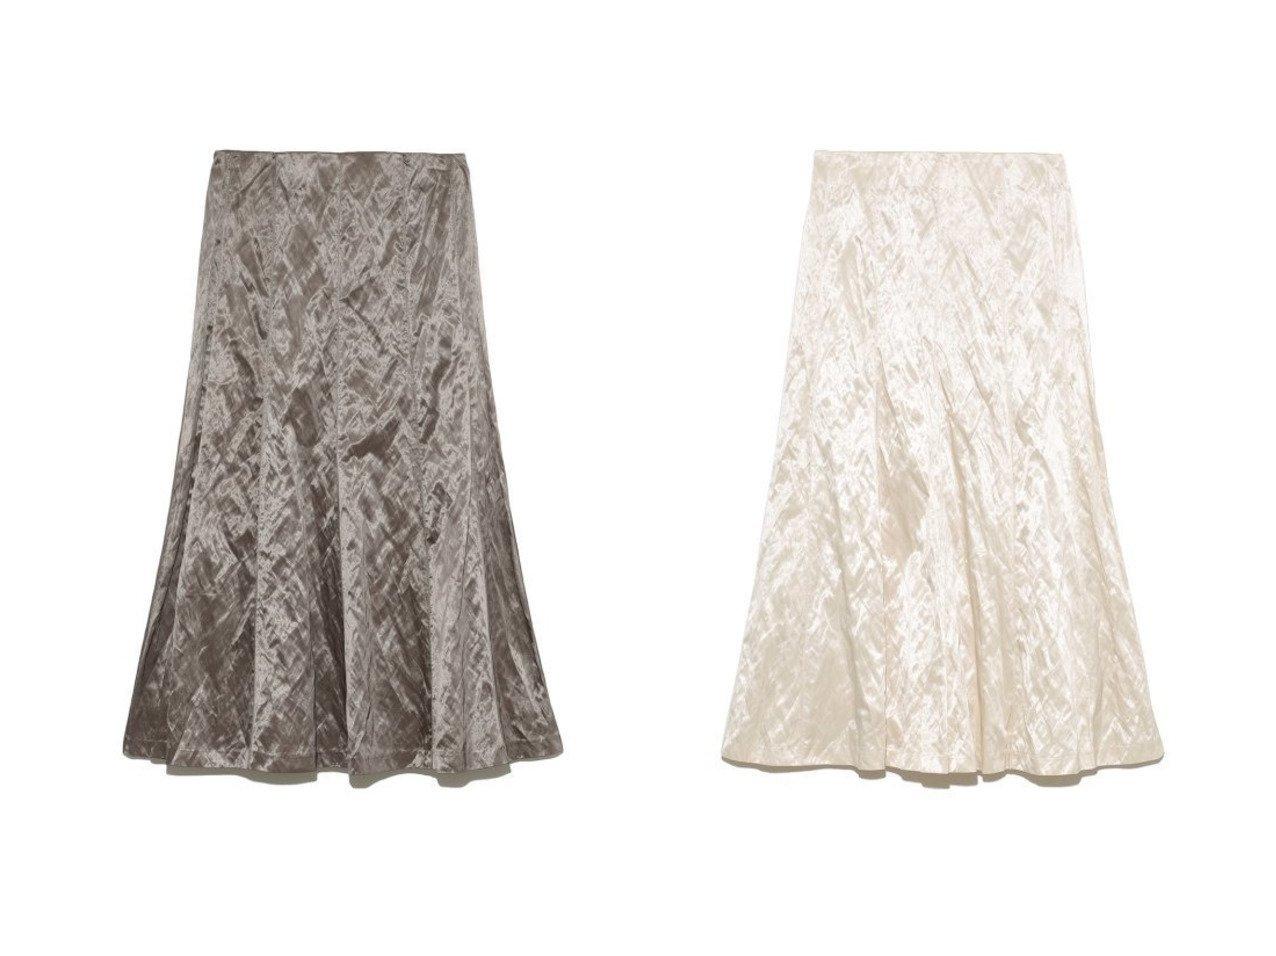 【Mila Owen/ミラオーウェン】のサテン地パネルデザインミディスカート Mila Owenのおすすめ!人気、トレンド・レディースファッションの通販 おすすめで人気の流行・トレンド、ファッションの通販商品 メンズファッション・キッズファッション・インテリア・家具・レディースファッション・服の通販 founy(ファニー) https://founy.com/ ファッション Fashion レディースファッション WOMEN スカート Skirt サテン スマート ダウン 再入荷 Restock/Back in Stock/Re Arrival |ID:crp329100000019932